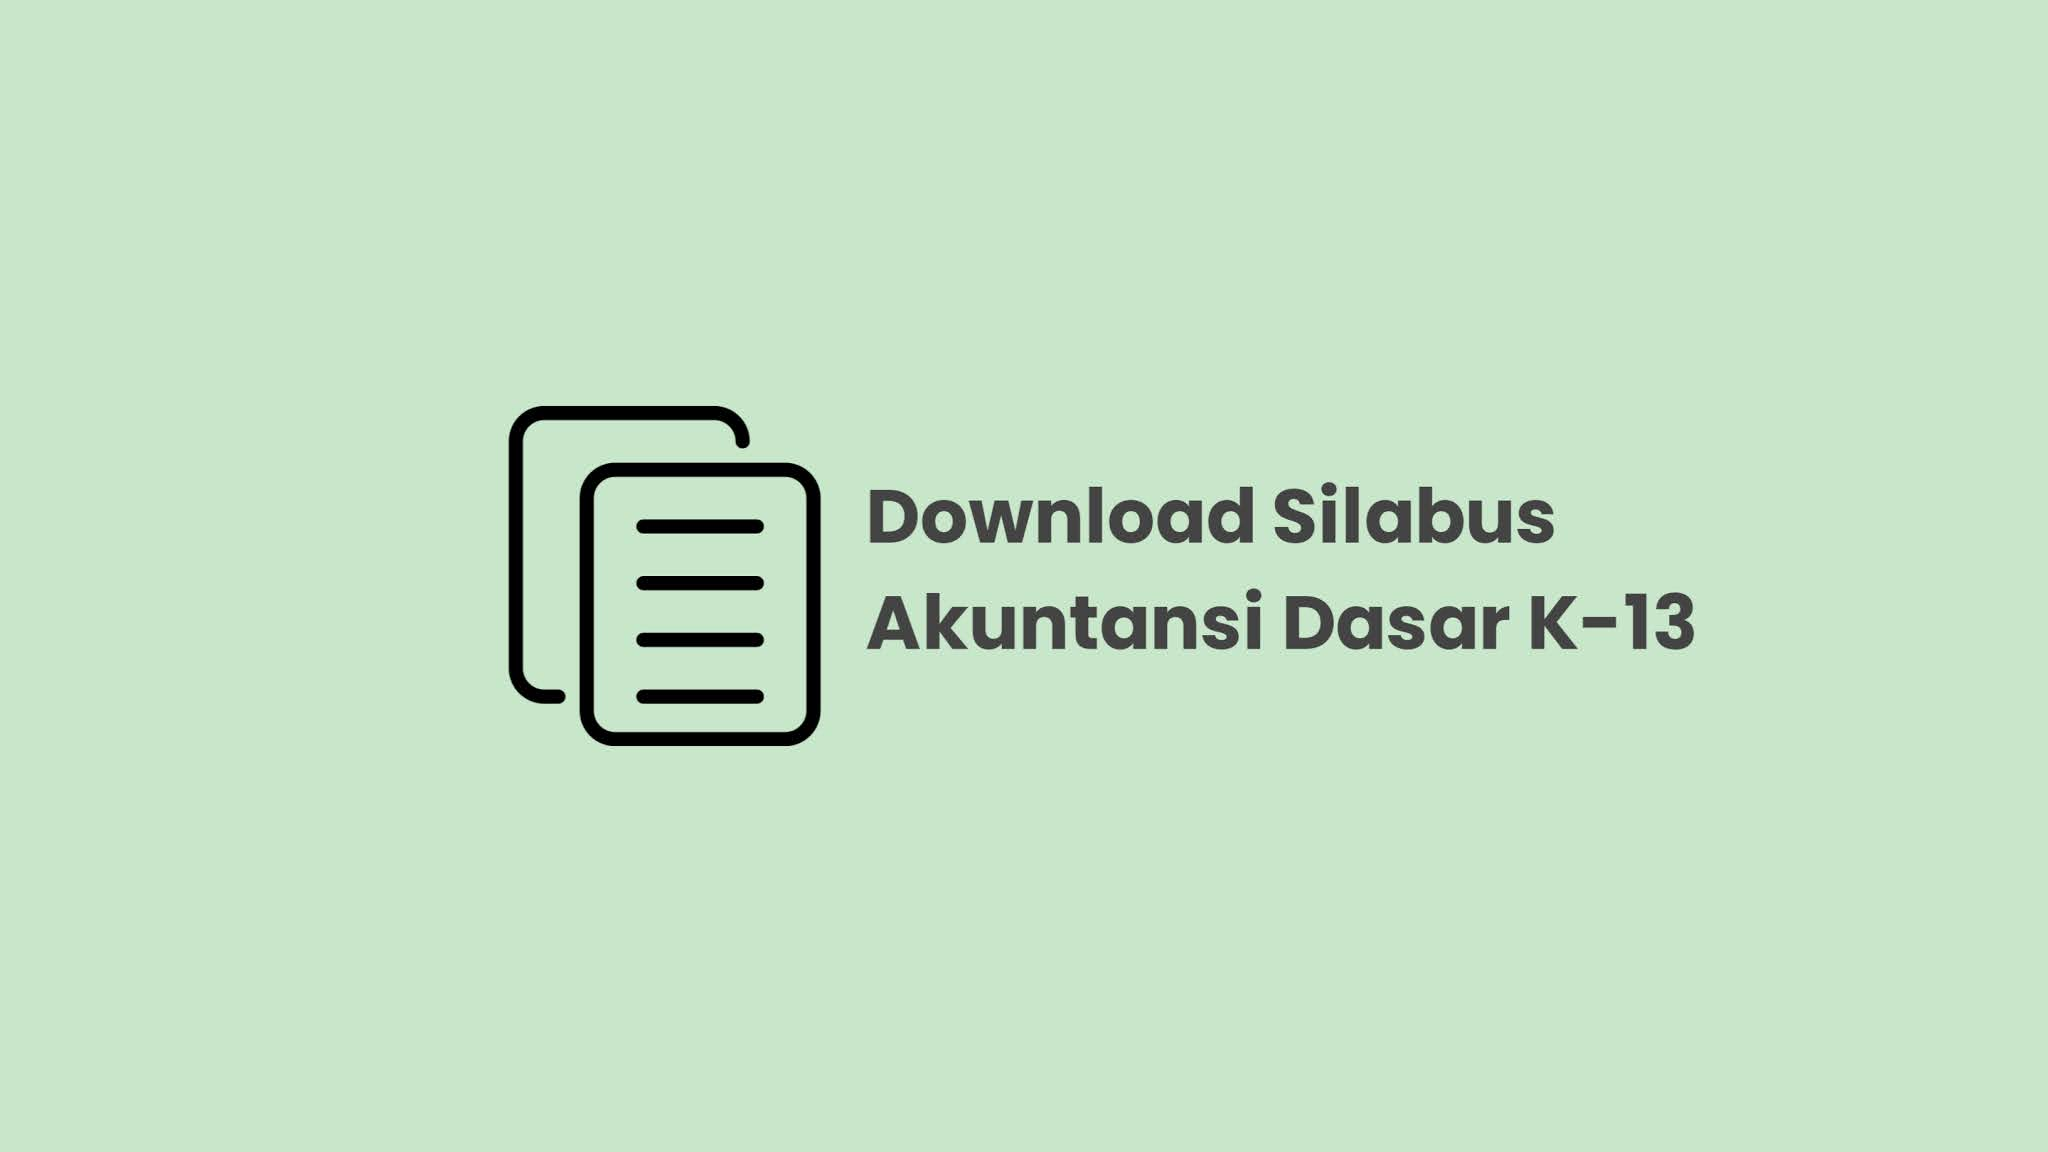 Download Silabus Akuntansi Dasar Kelas X Kurikulum 2013 Revisi 2017